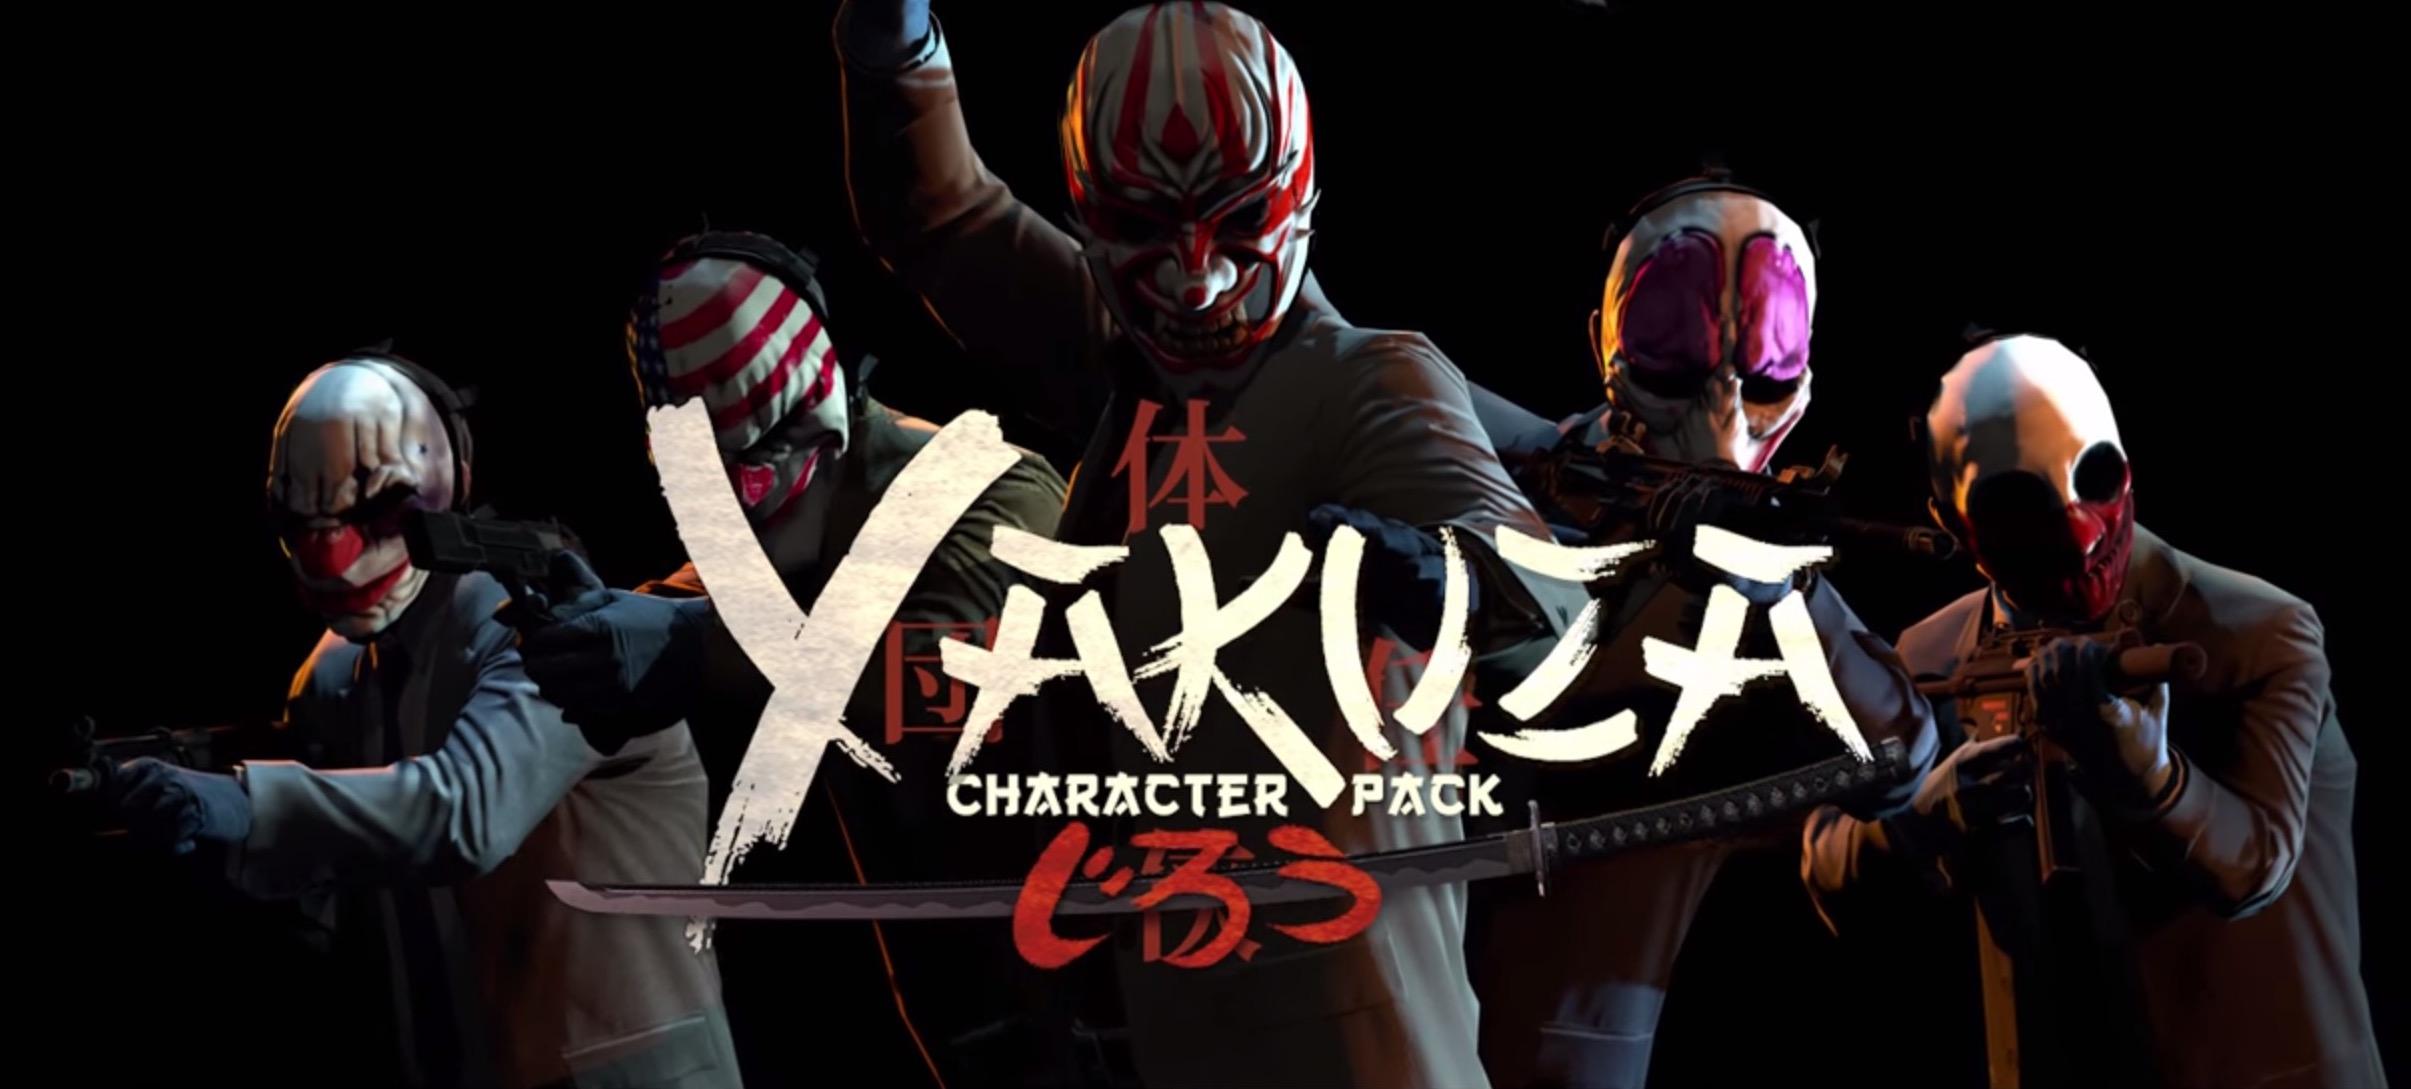 PayDay 2, arriva il character pack Yakuza: ecco il trailer ufficiale